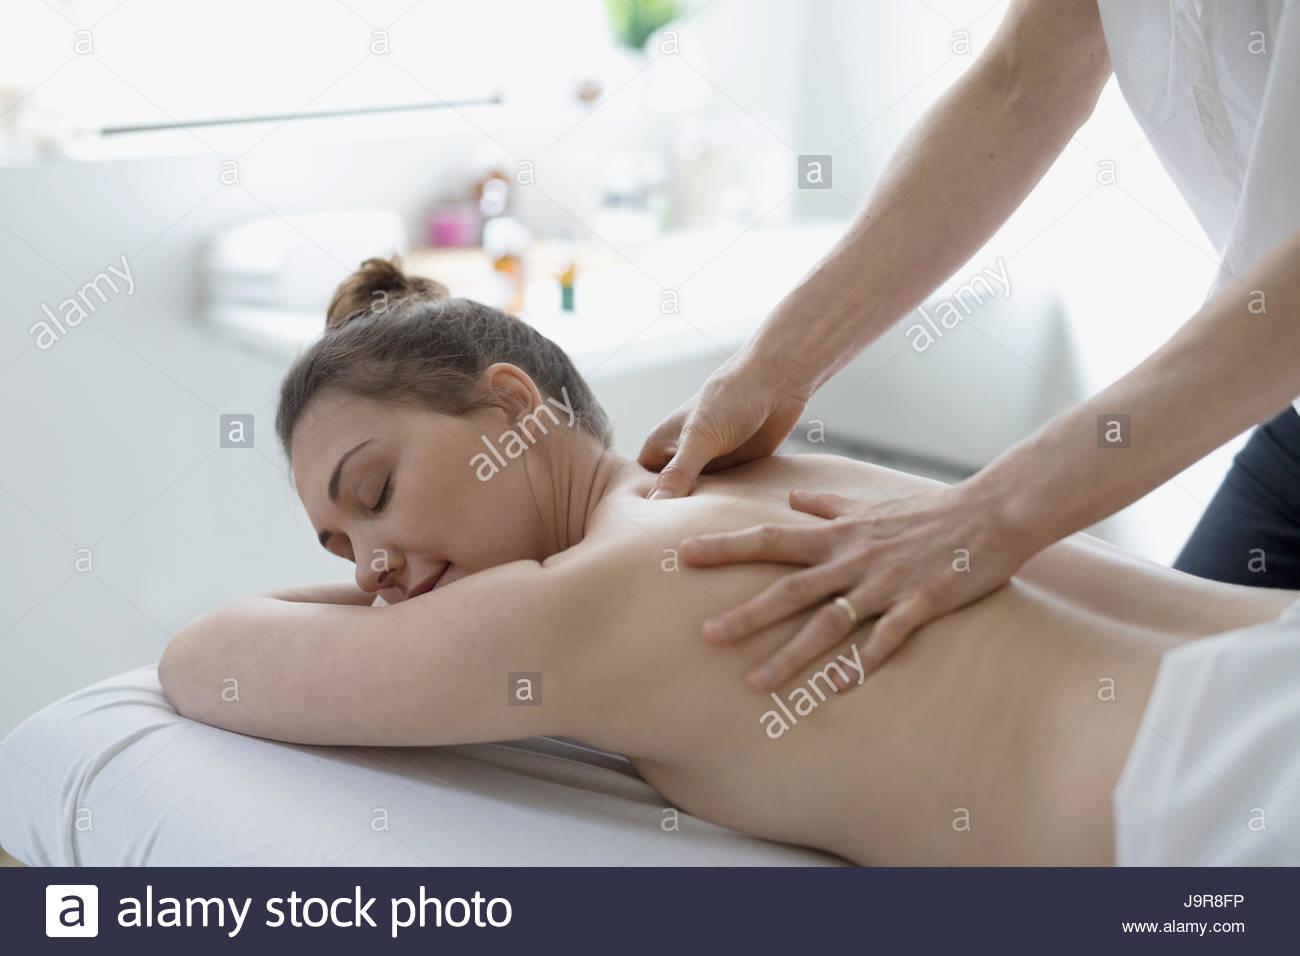 Serene woman receiving massage on spa massage table - Stock Image